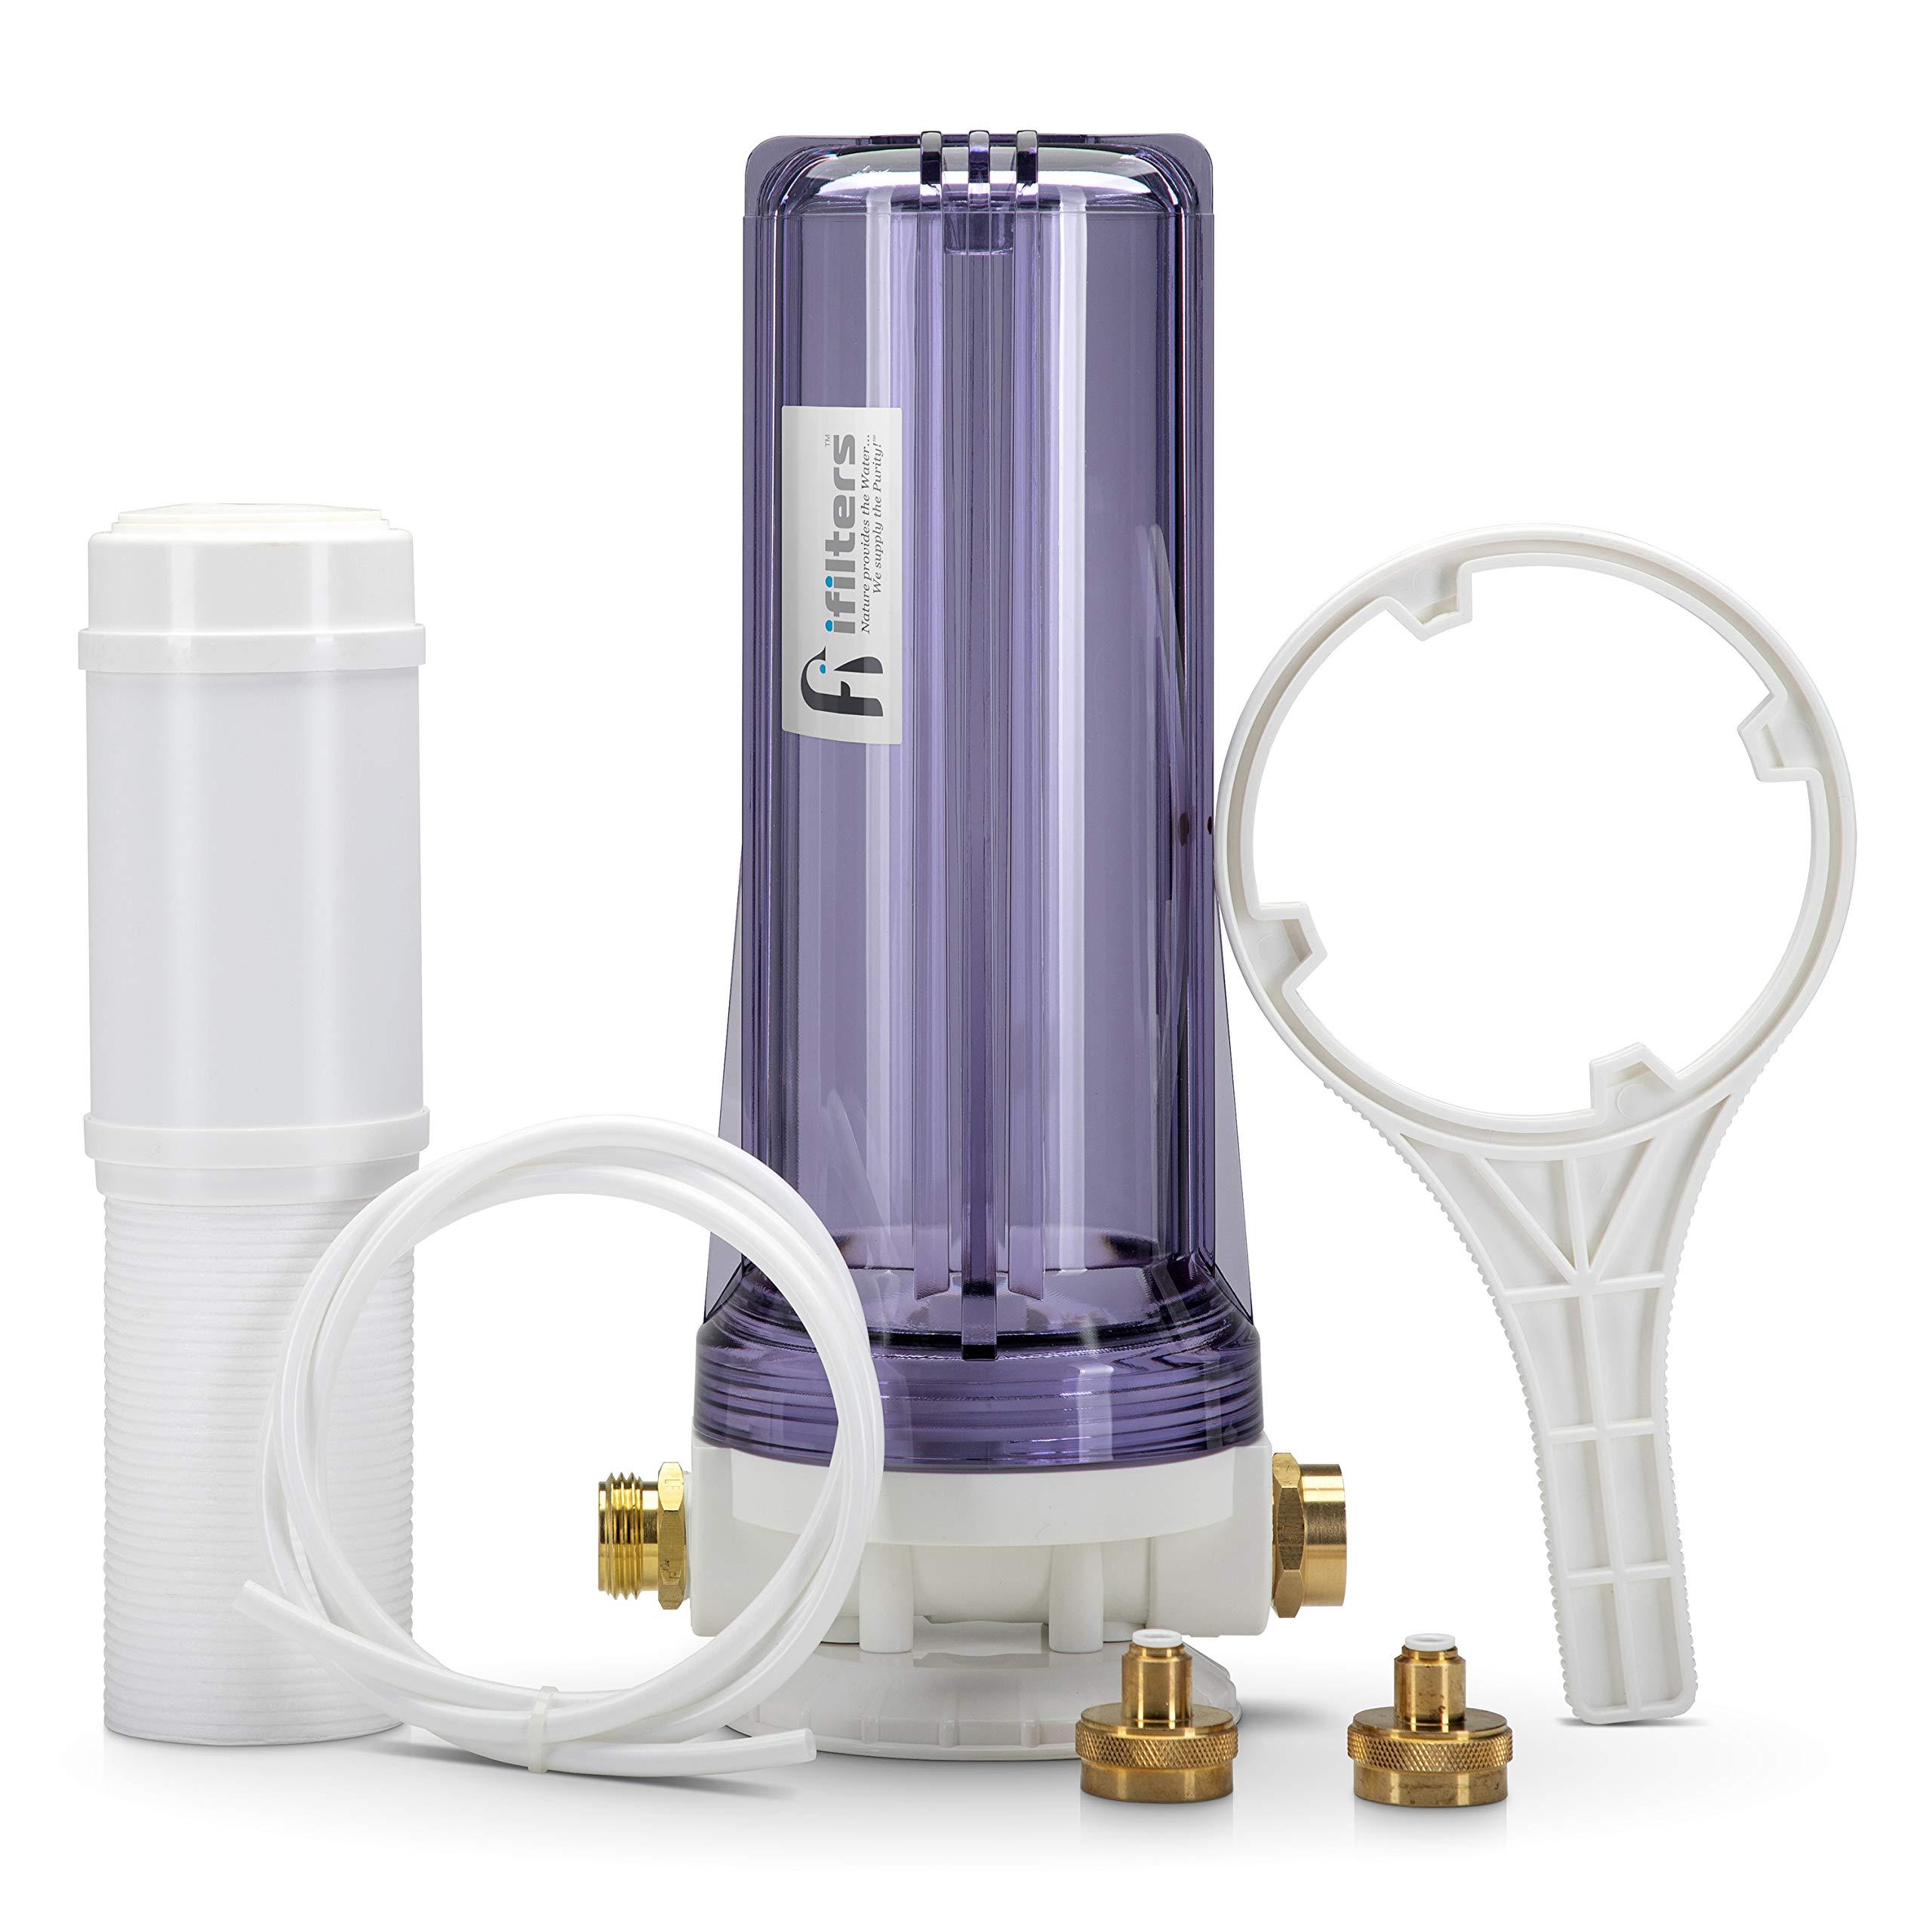 Premium Dual RV/Marine Water Softener Regeneration Kit and Water Filter, Reduces Bad Taste, Odor, Sediment, Chlorine by iFilters